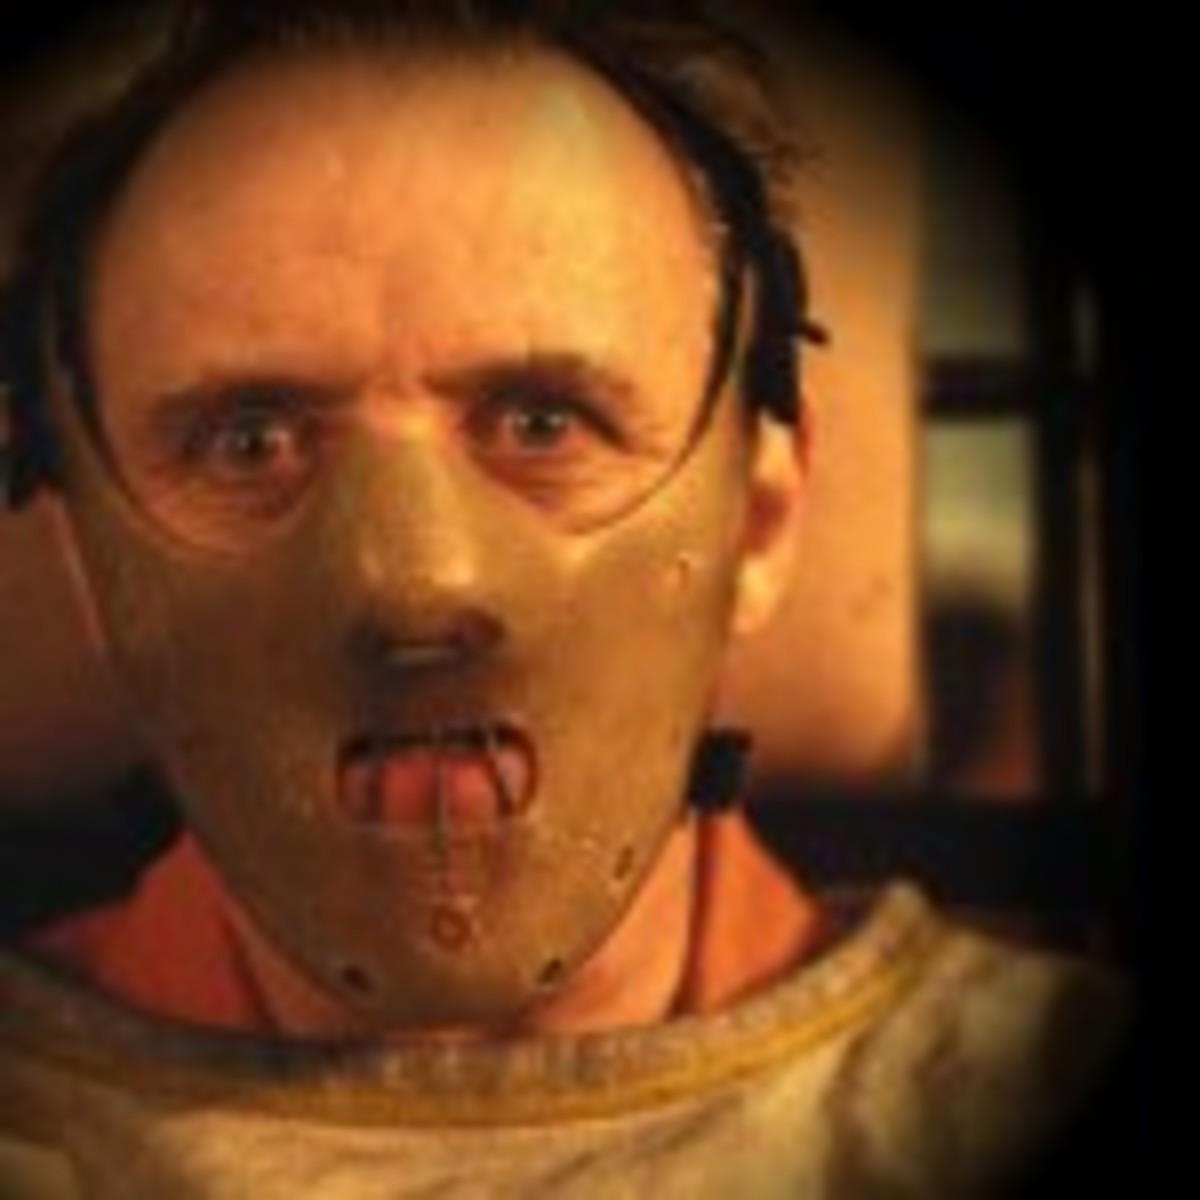 Hannibal Lecter movie villain